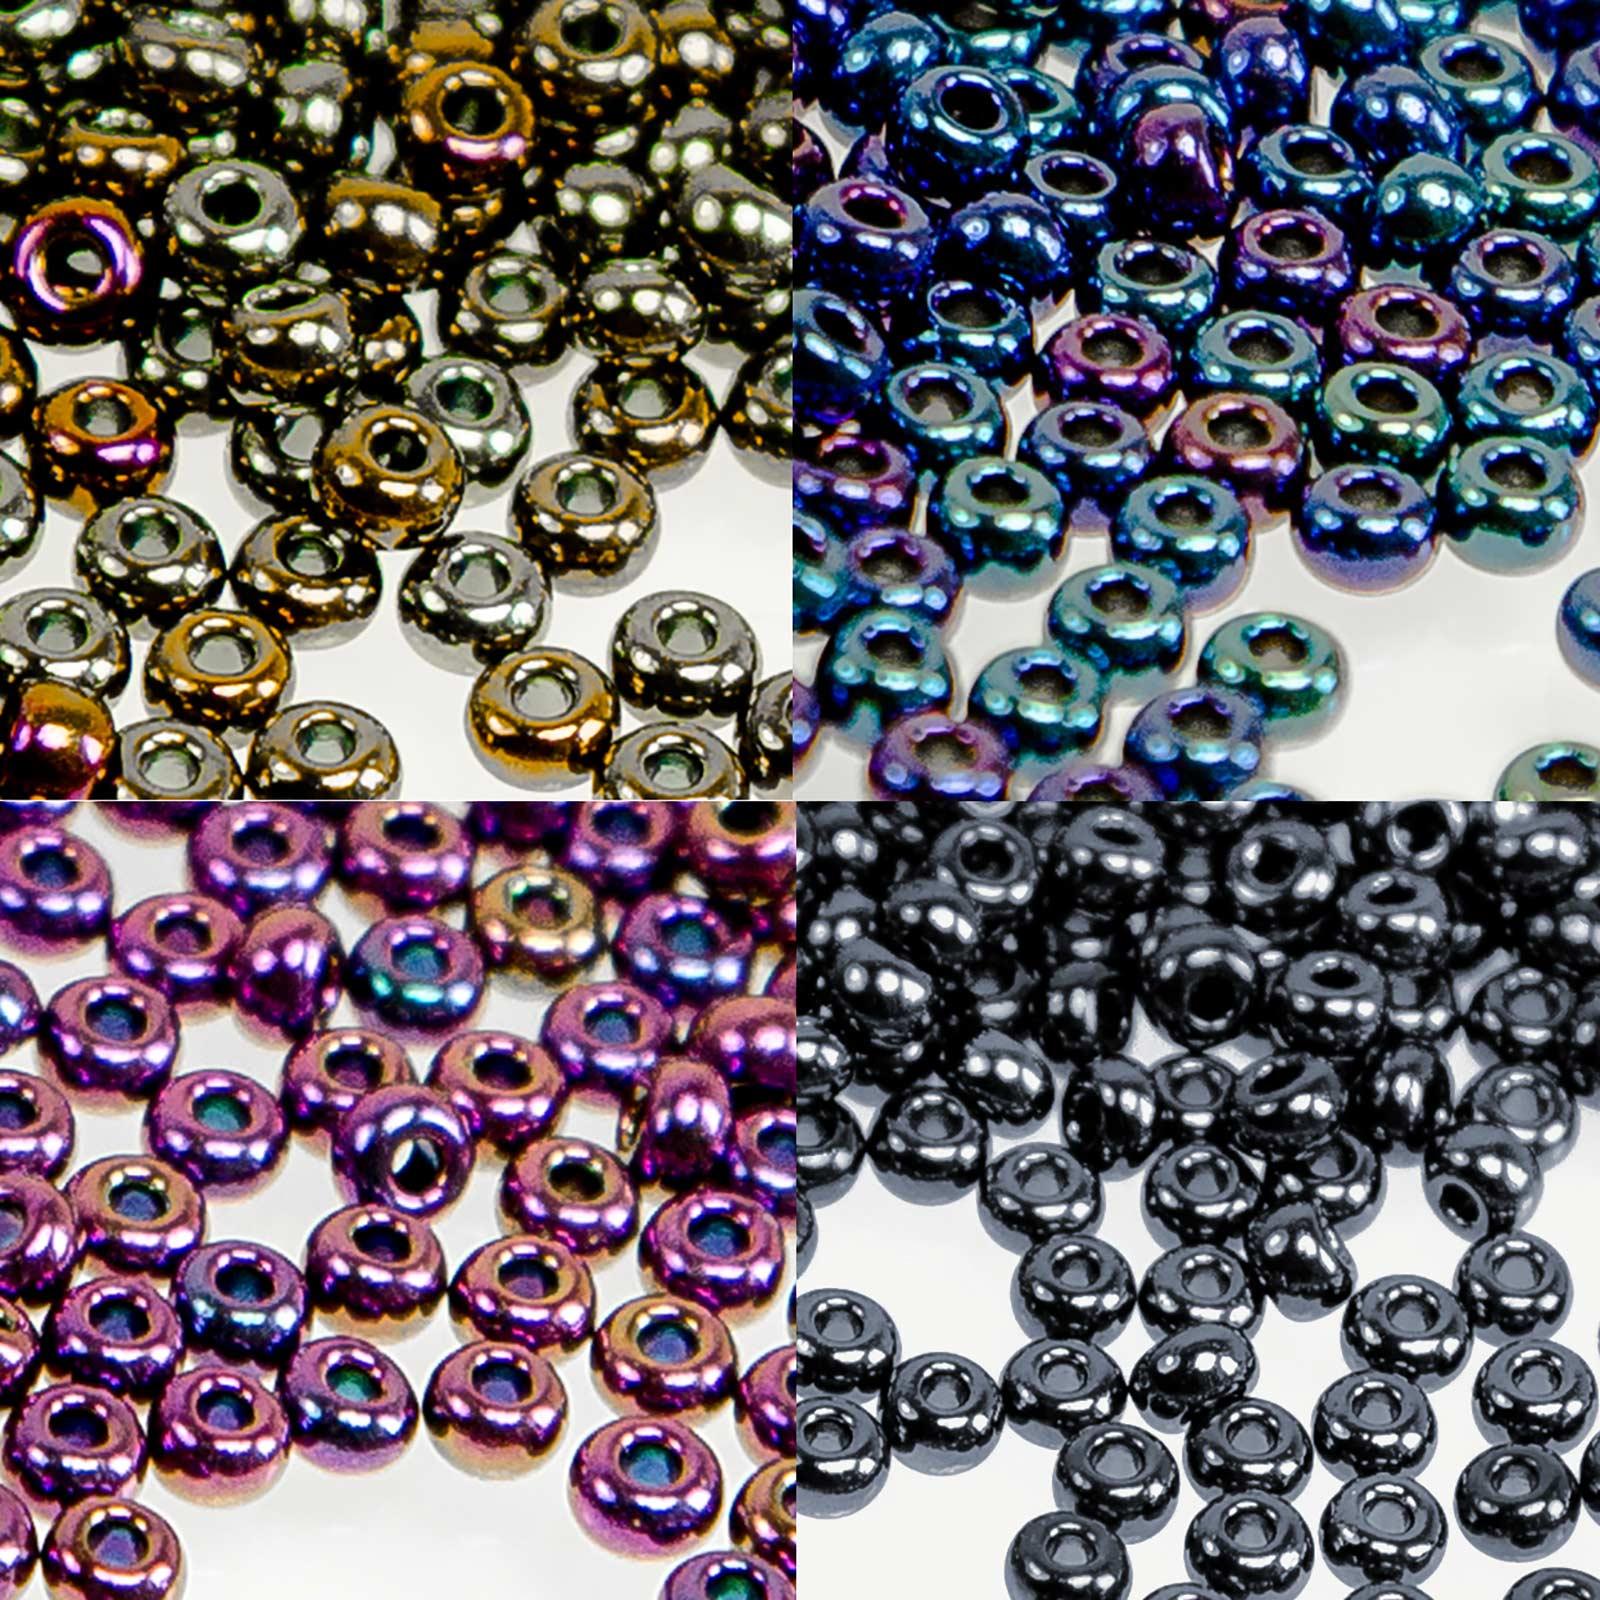 Effekt Wandfarbe Bronze Metallic: 20g Rocailles Glasperlen 8/0 3mm, Iris Effekt